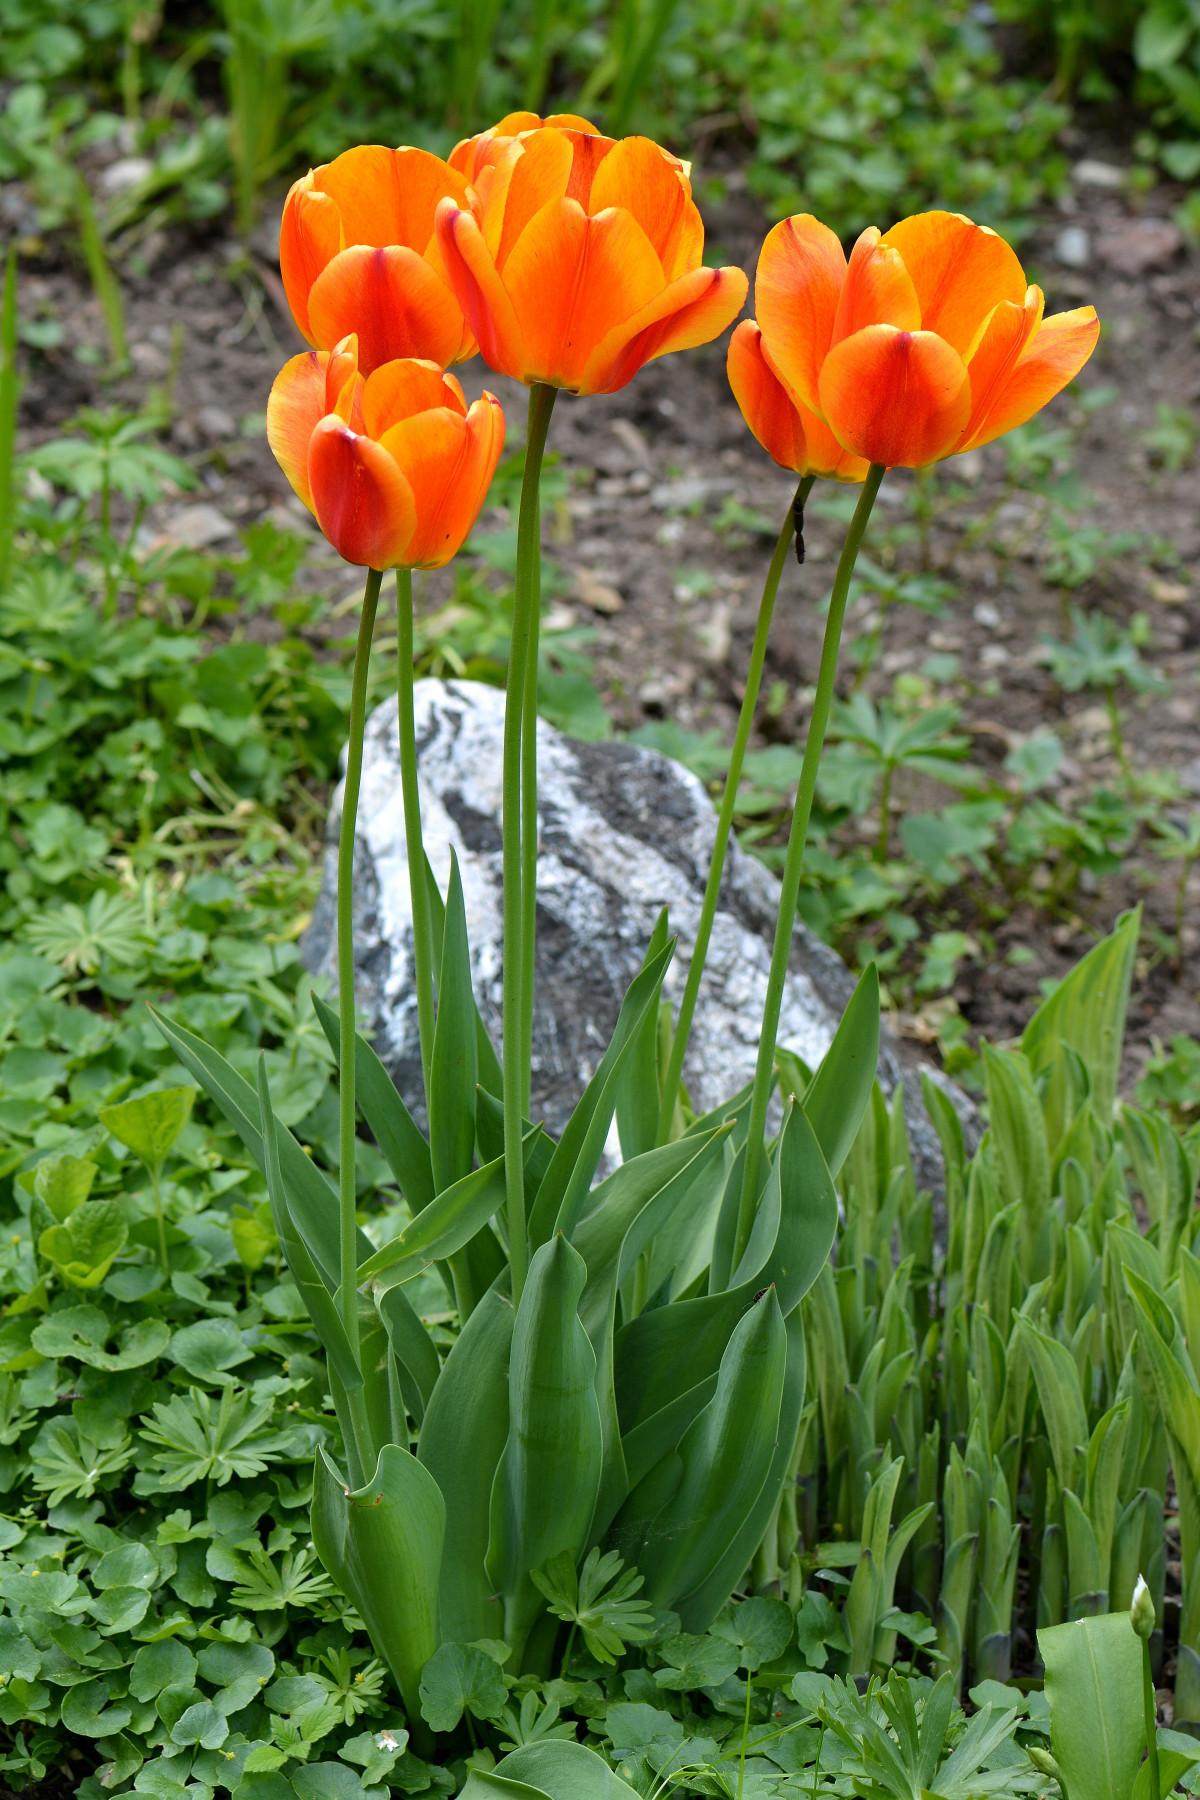 Fotos gratis naturaleza flor tulip n naranja - Cortar hierba alta ...